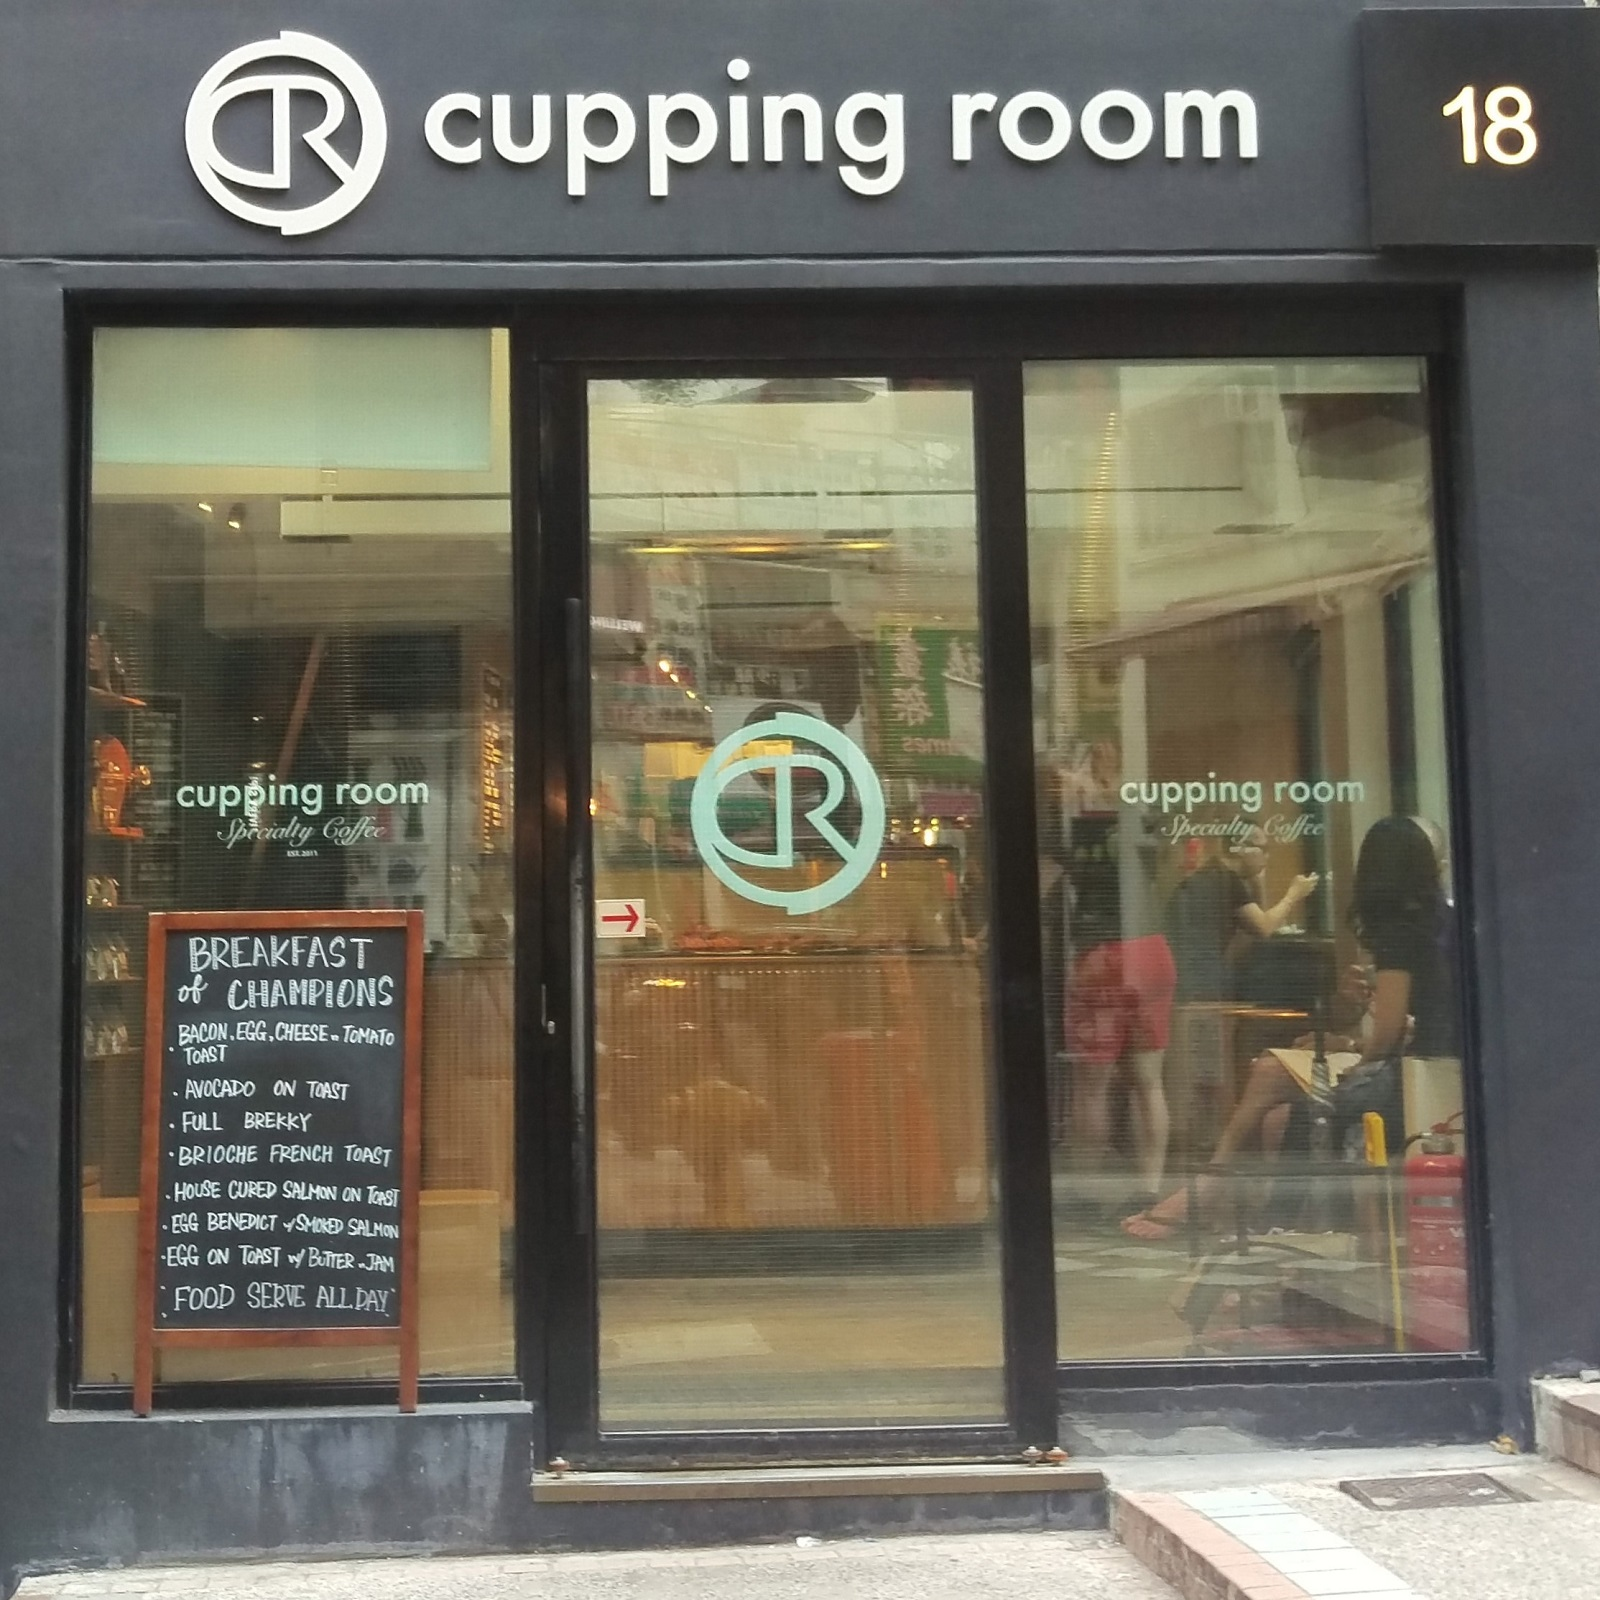 Cupping Room Menu